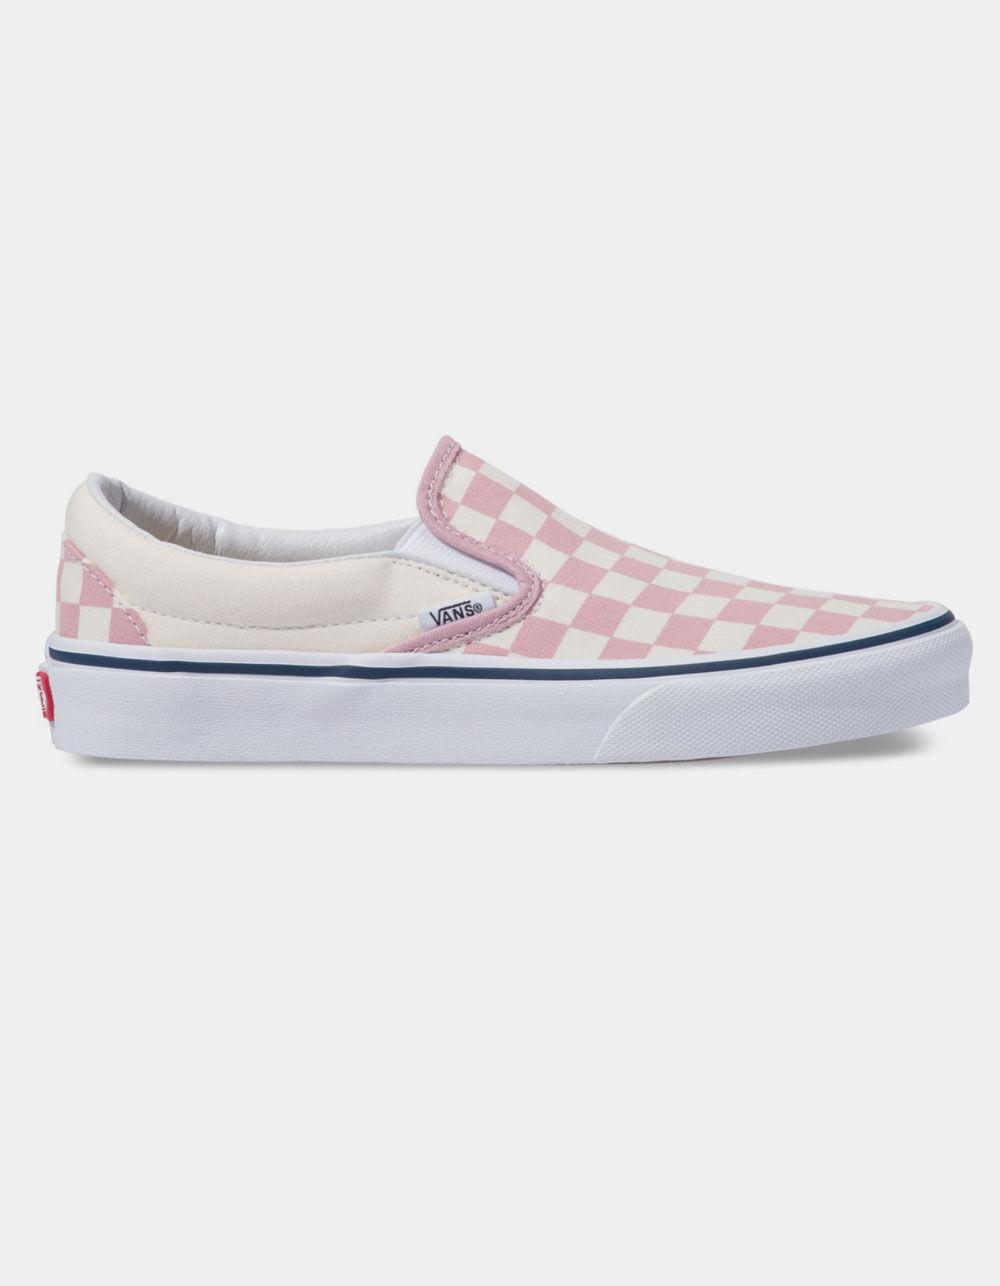 Vans Canvas Checkerboard Classic Slip